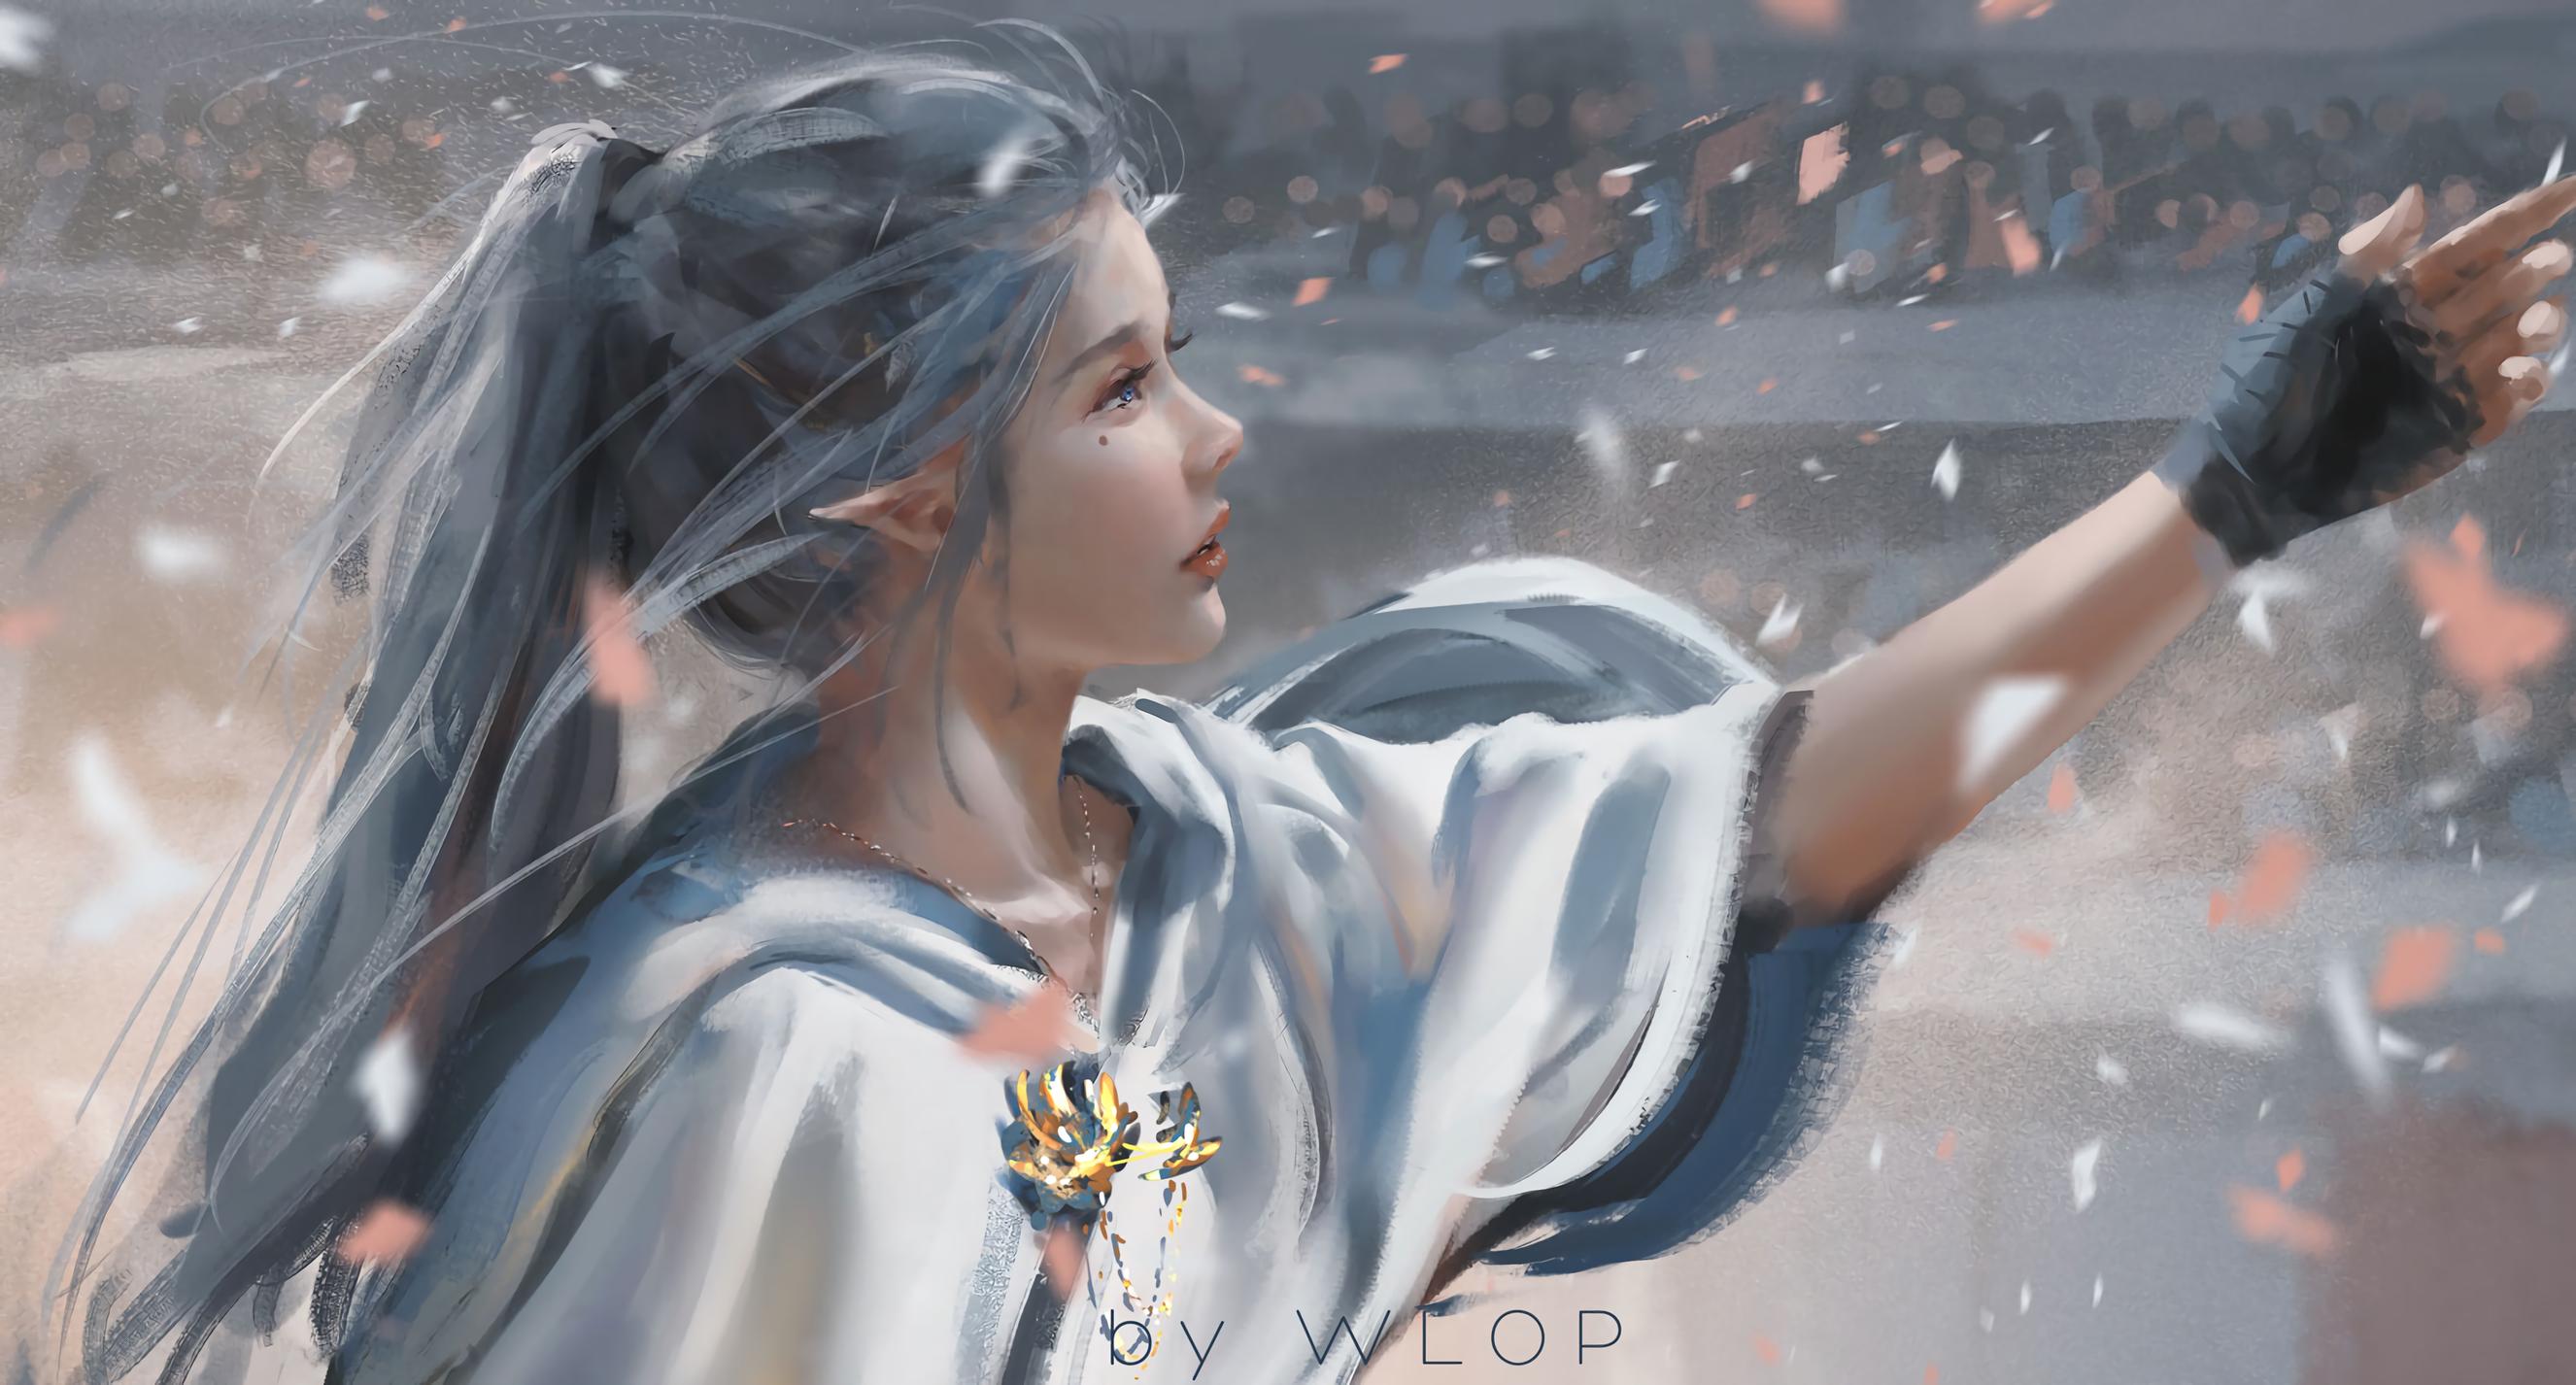 General 2652x1426 digital art artwork WLOP women white hair pointy ears blue eyes elves